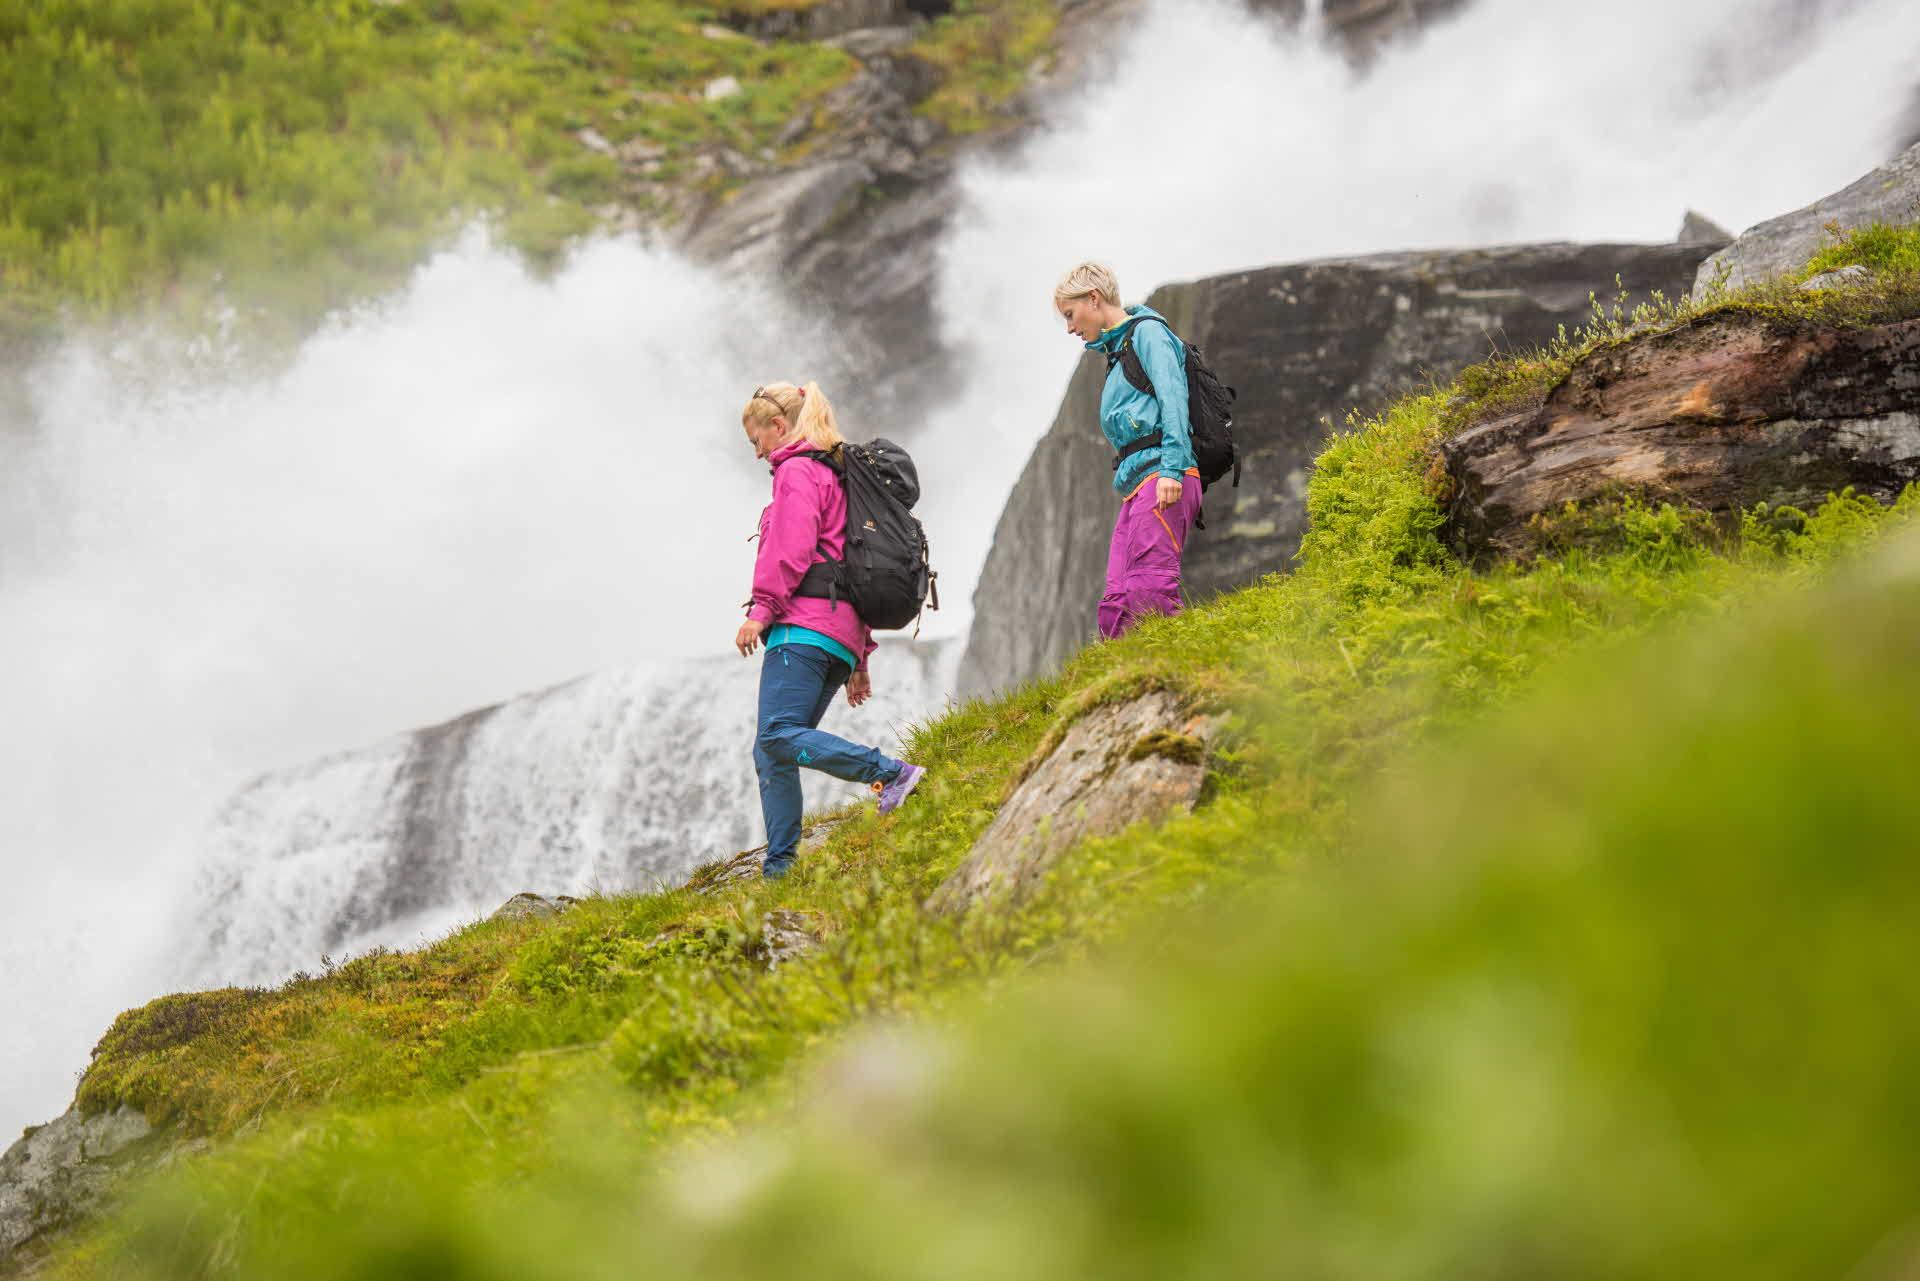 Dos mujeres descienden junto a una cascada en Vikafjell